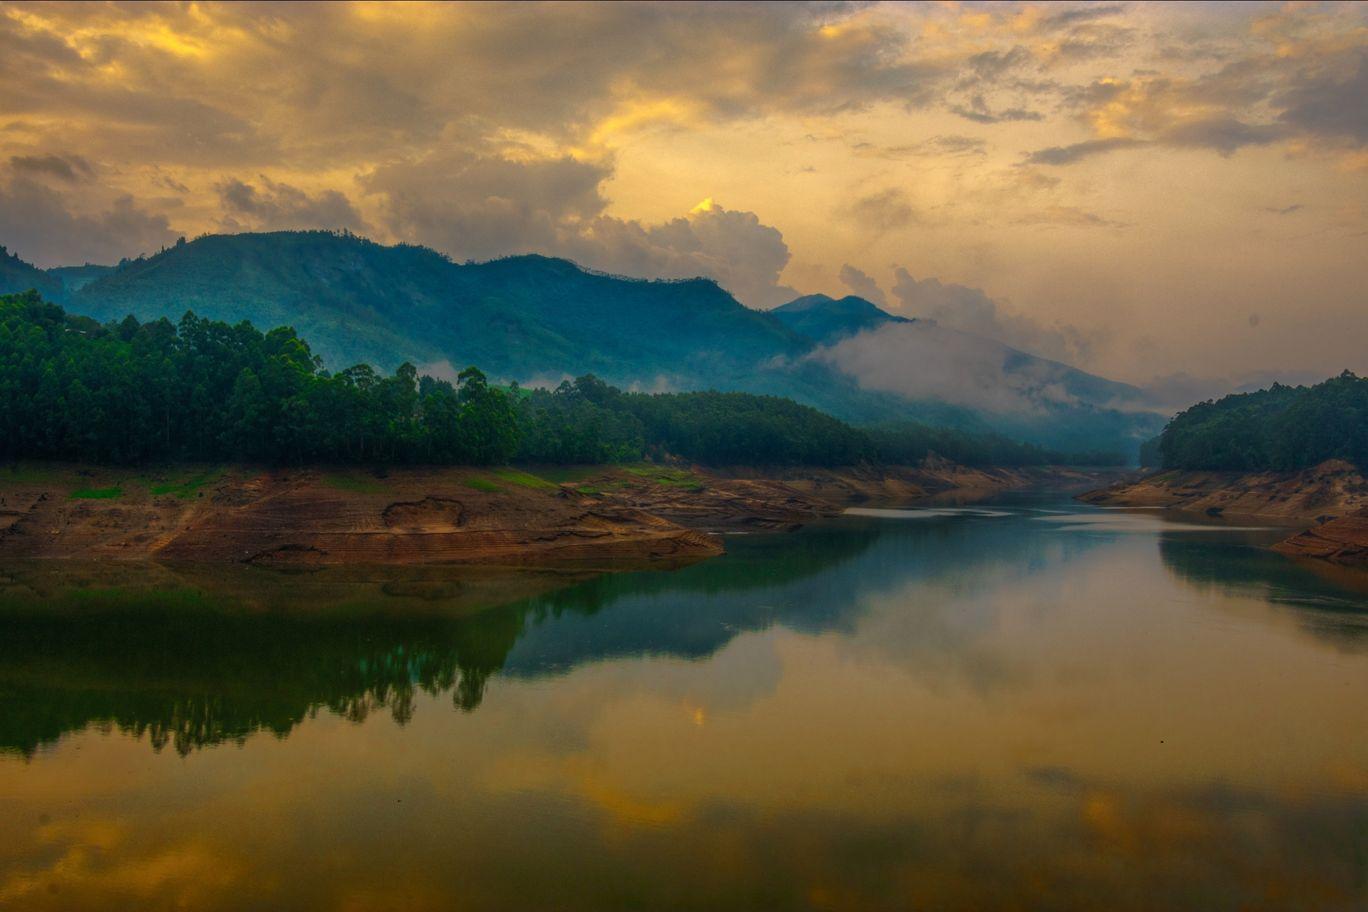 Photo of Mattupetty Dam By Rishab Tripathy